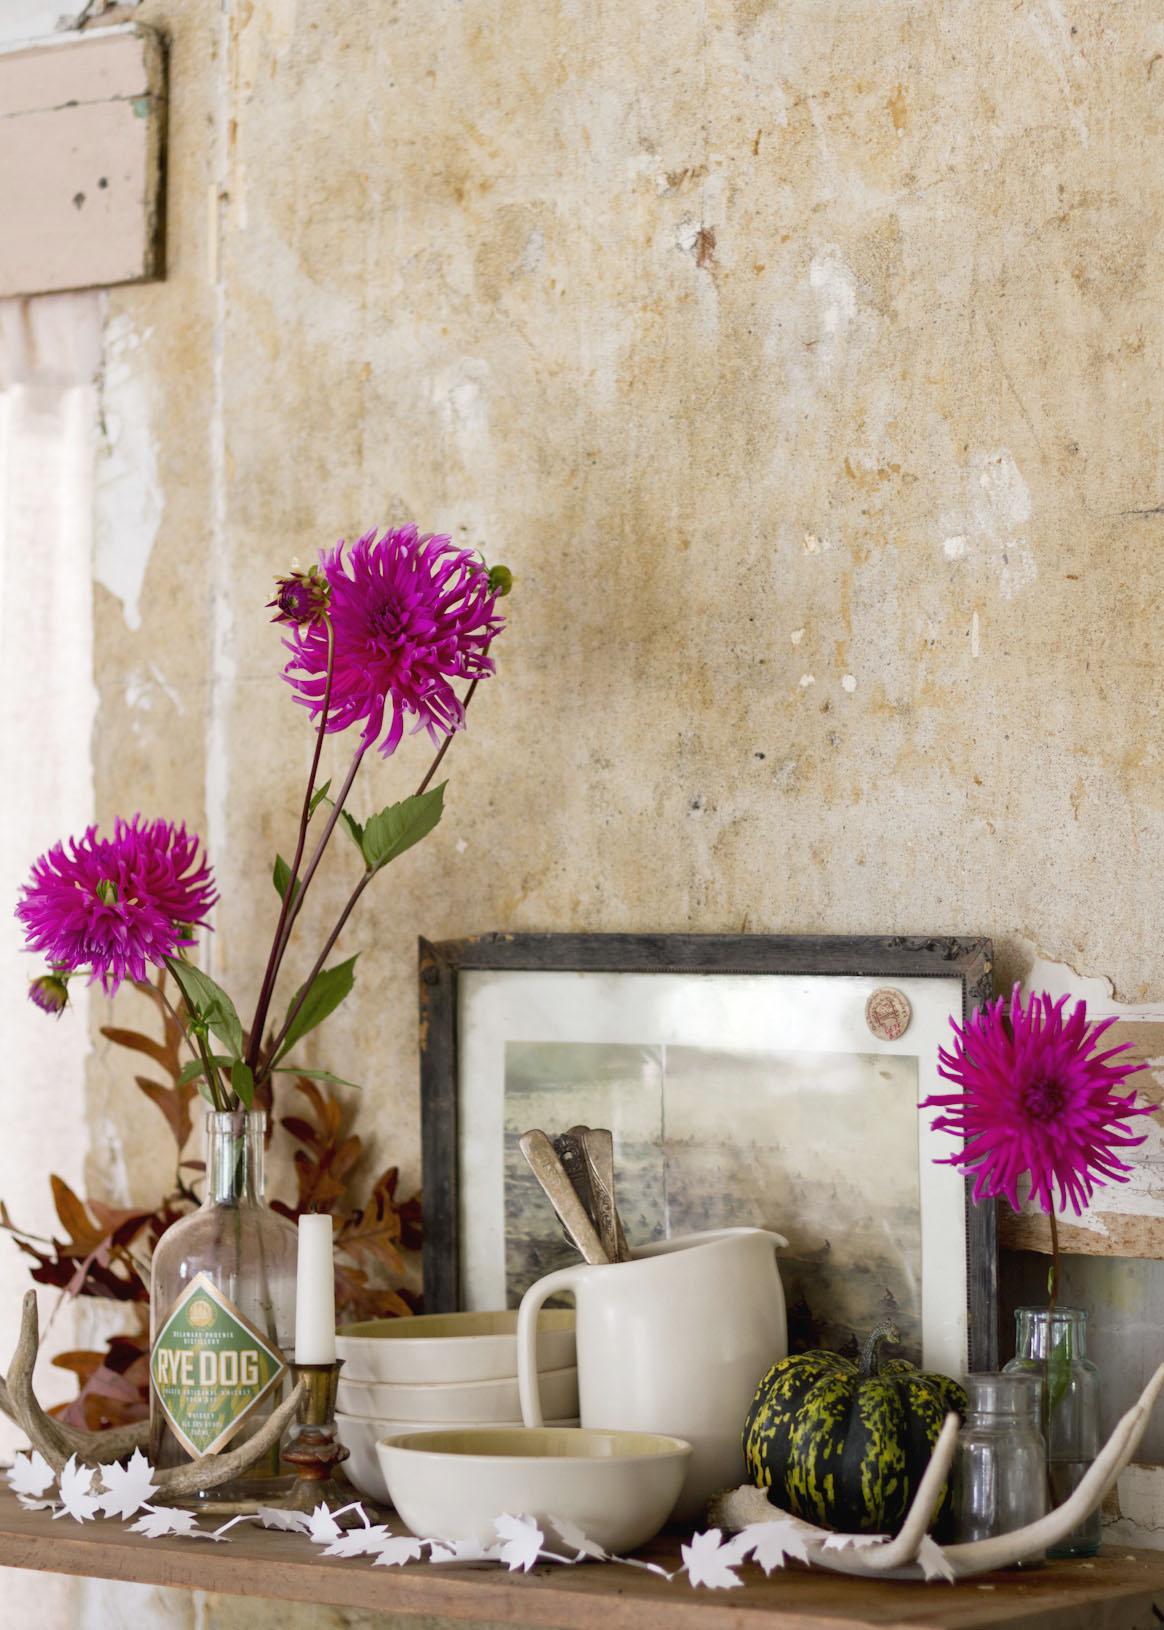 kitchen-shelf-autumn-rustic-lifestyle-still-life.jpg